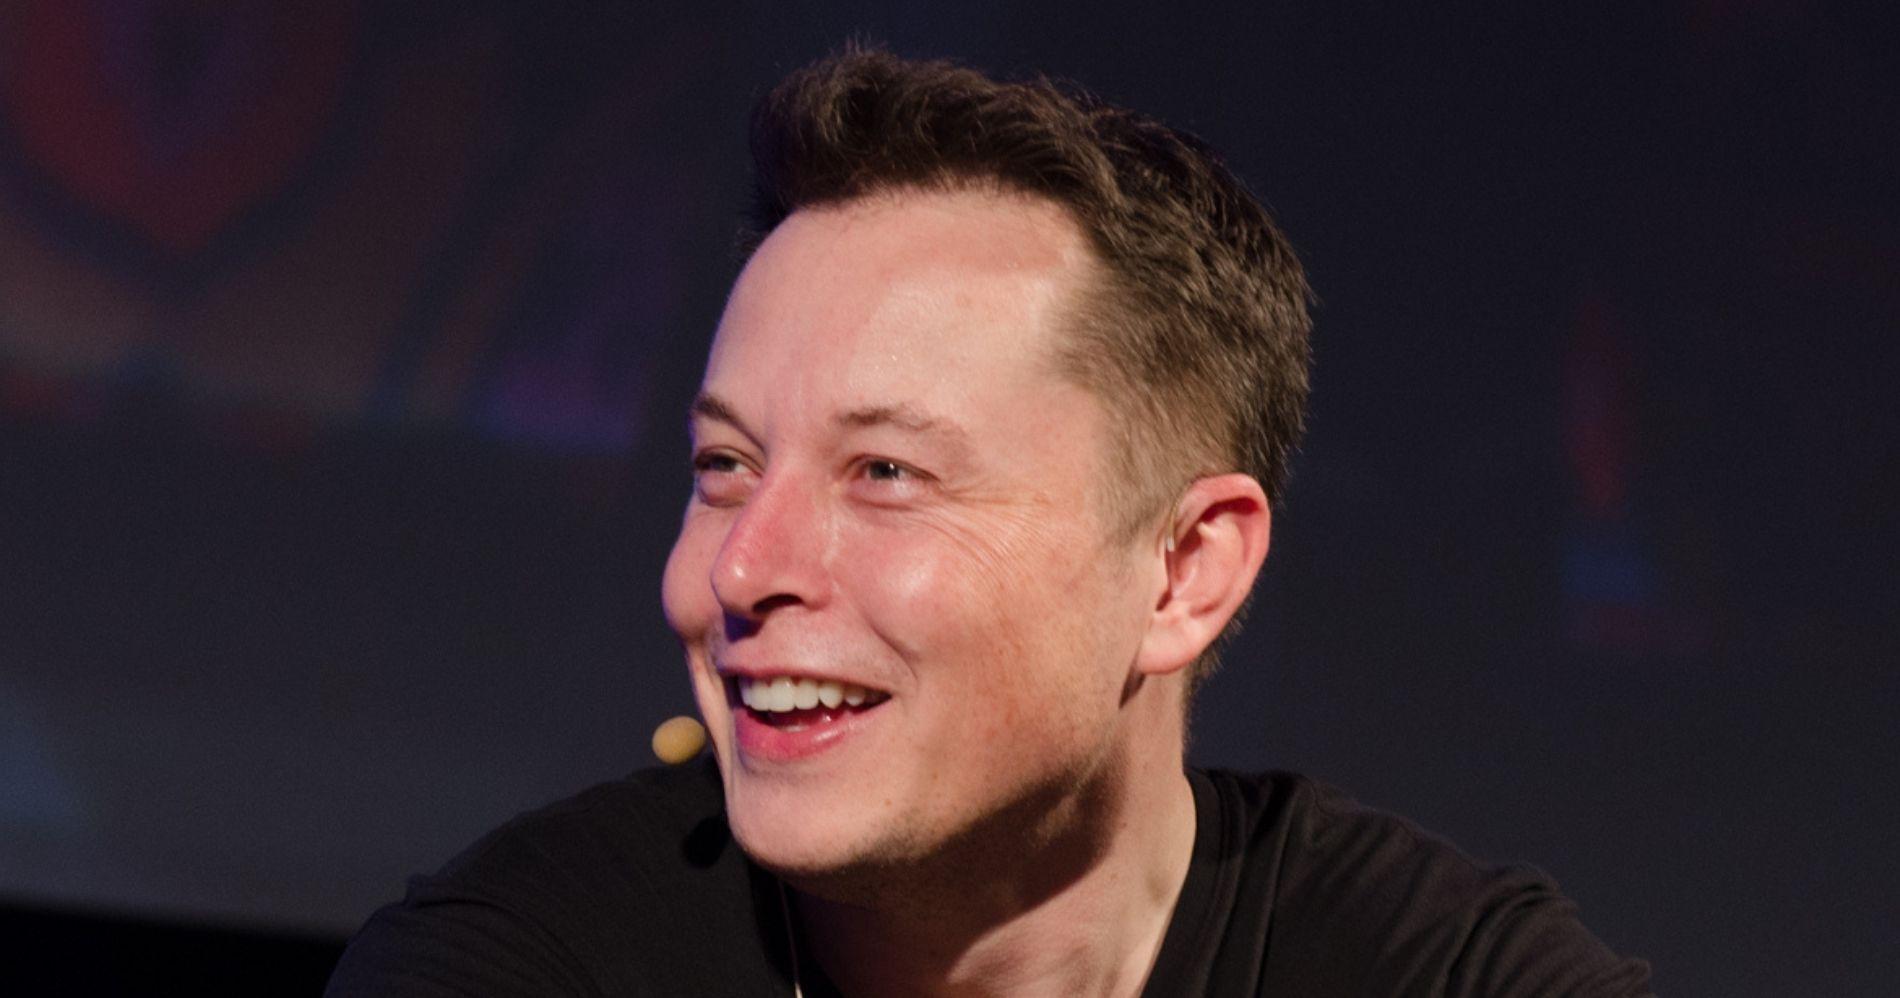 Investasi Elon Musk Illustration Web Bisnis Muda - Image: Wikimedia